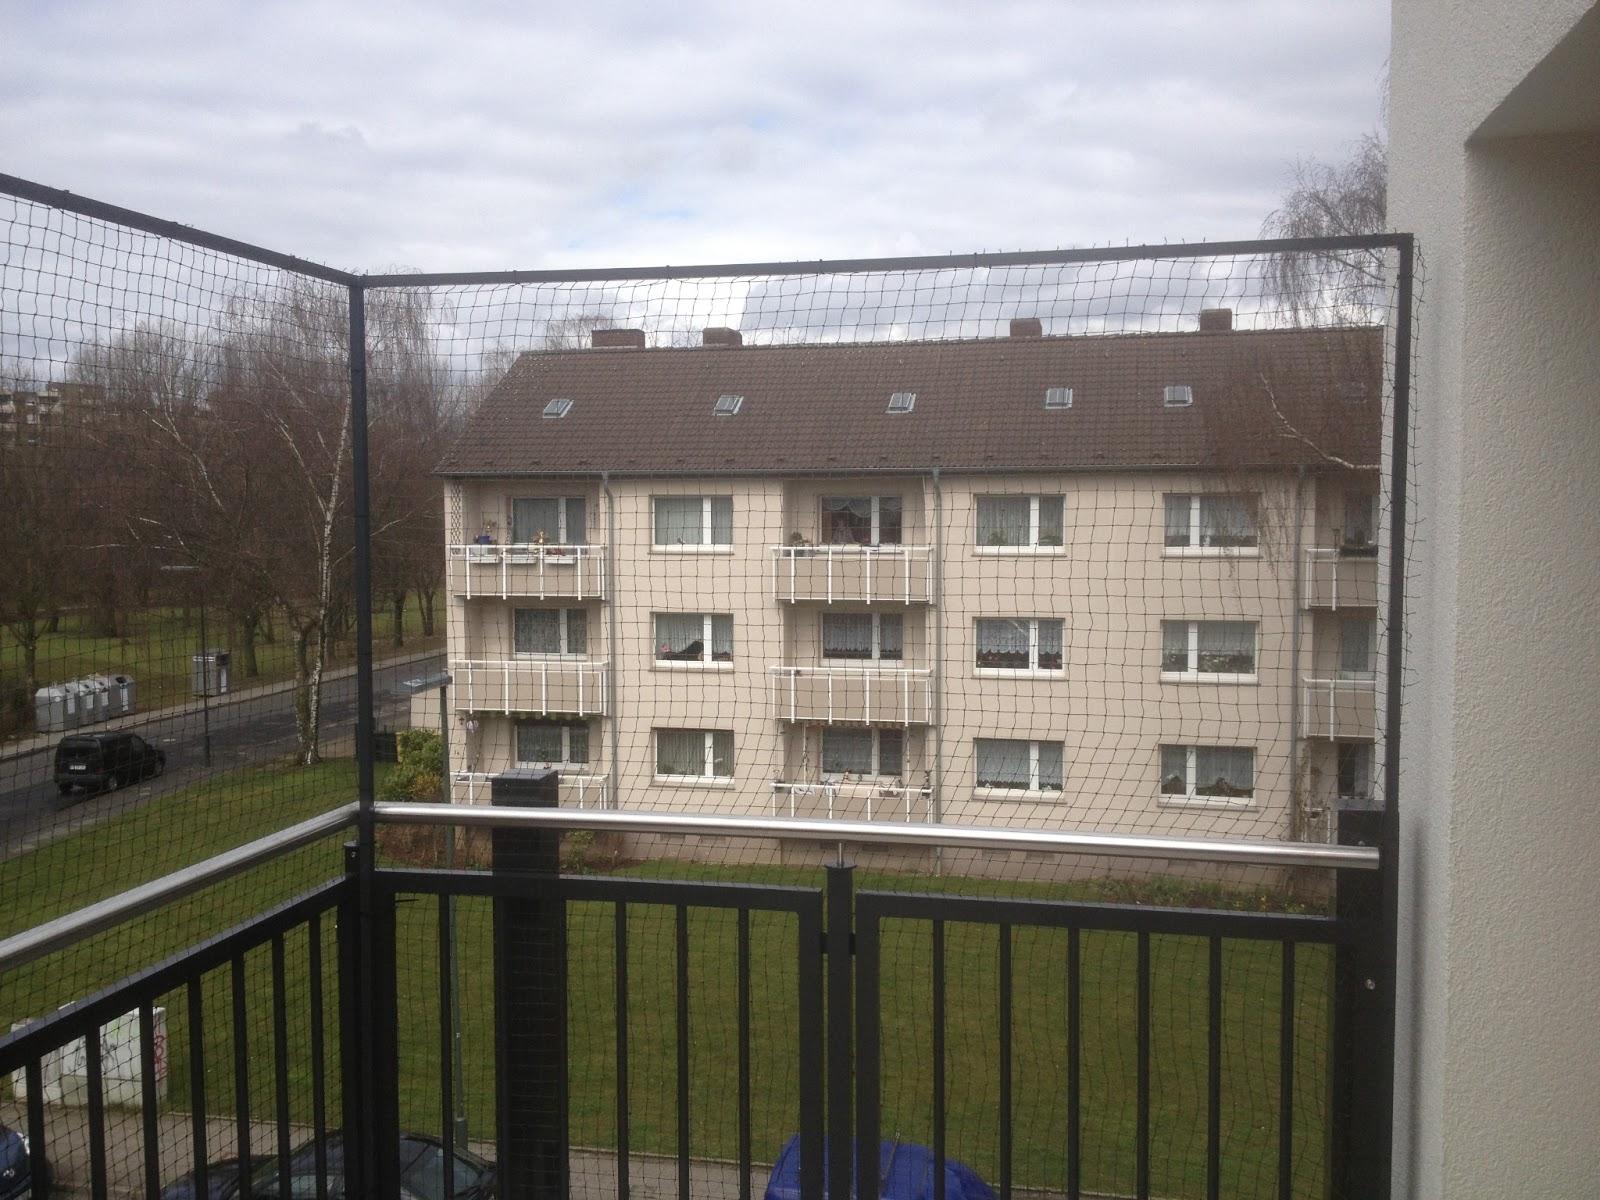 ... Katzennetz: Katzennetz Montage Düsseldorf, Freistehender Balkon mit